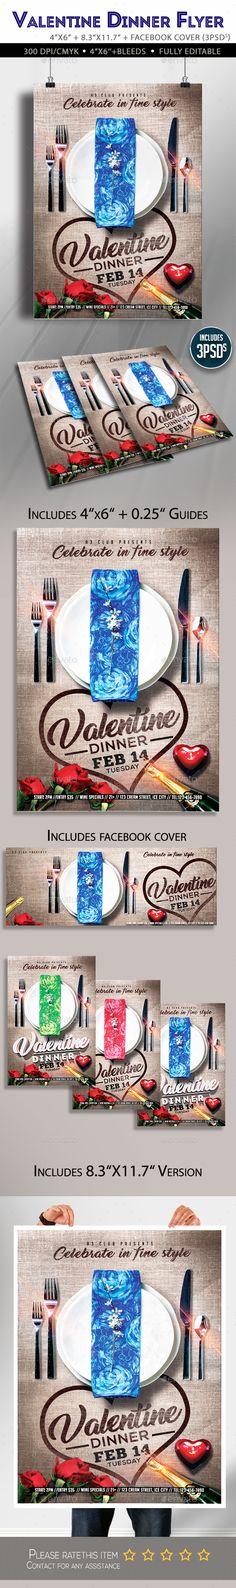 Valentine Day Flyer — Photoshop PSD #restaurant #valentine's • Available here → https://graphicriver.net/item/valentine-day-flyer/19327019?ref=pxcr